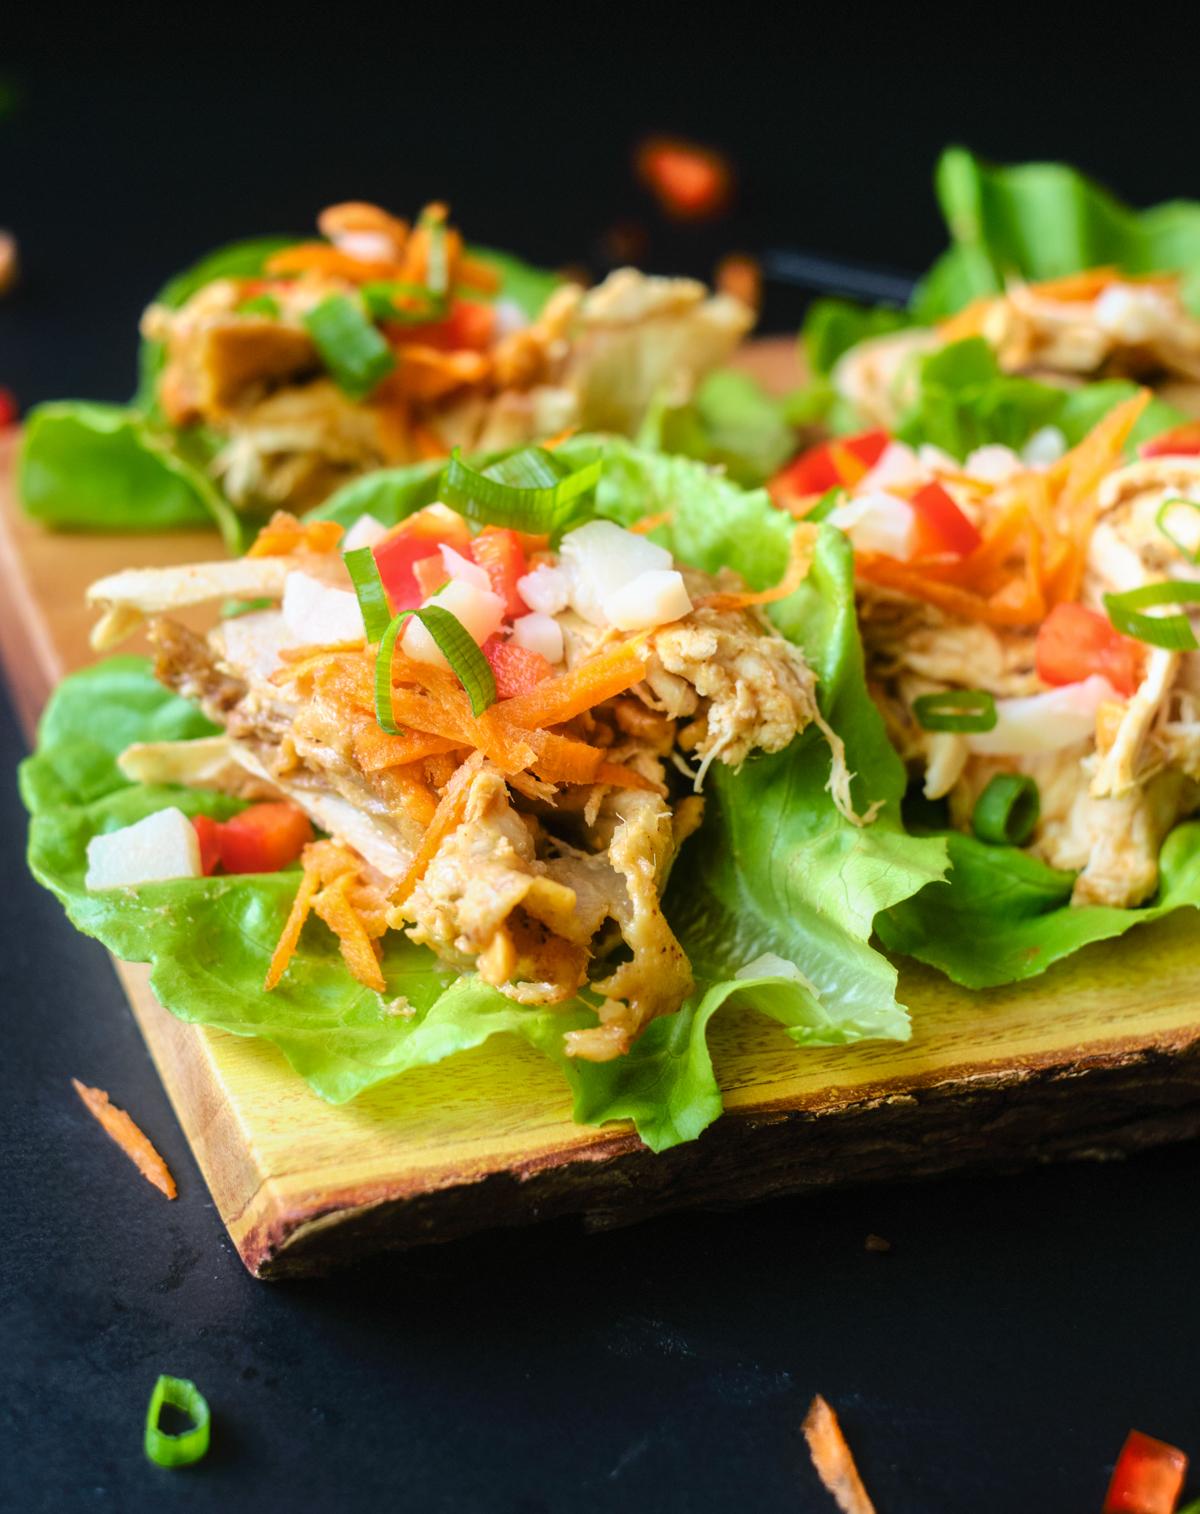 Recipe for Asian Chicken Lettuce Wraps